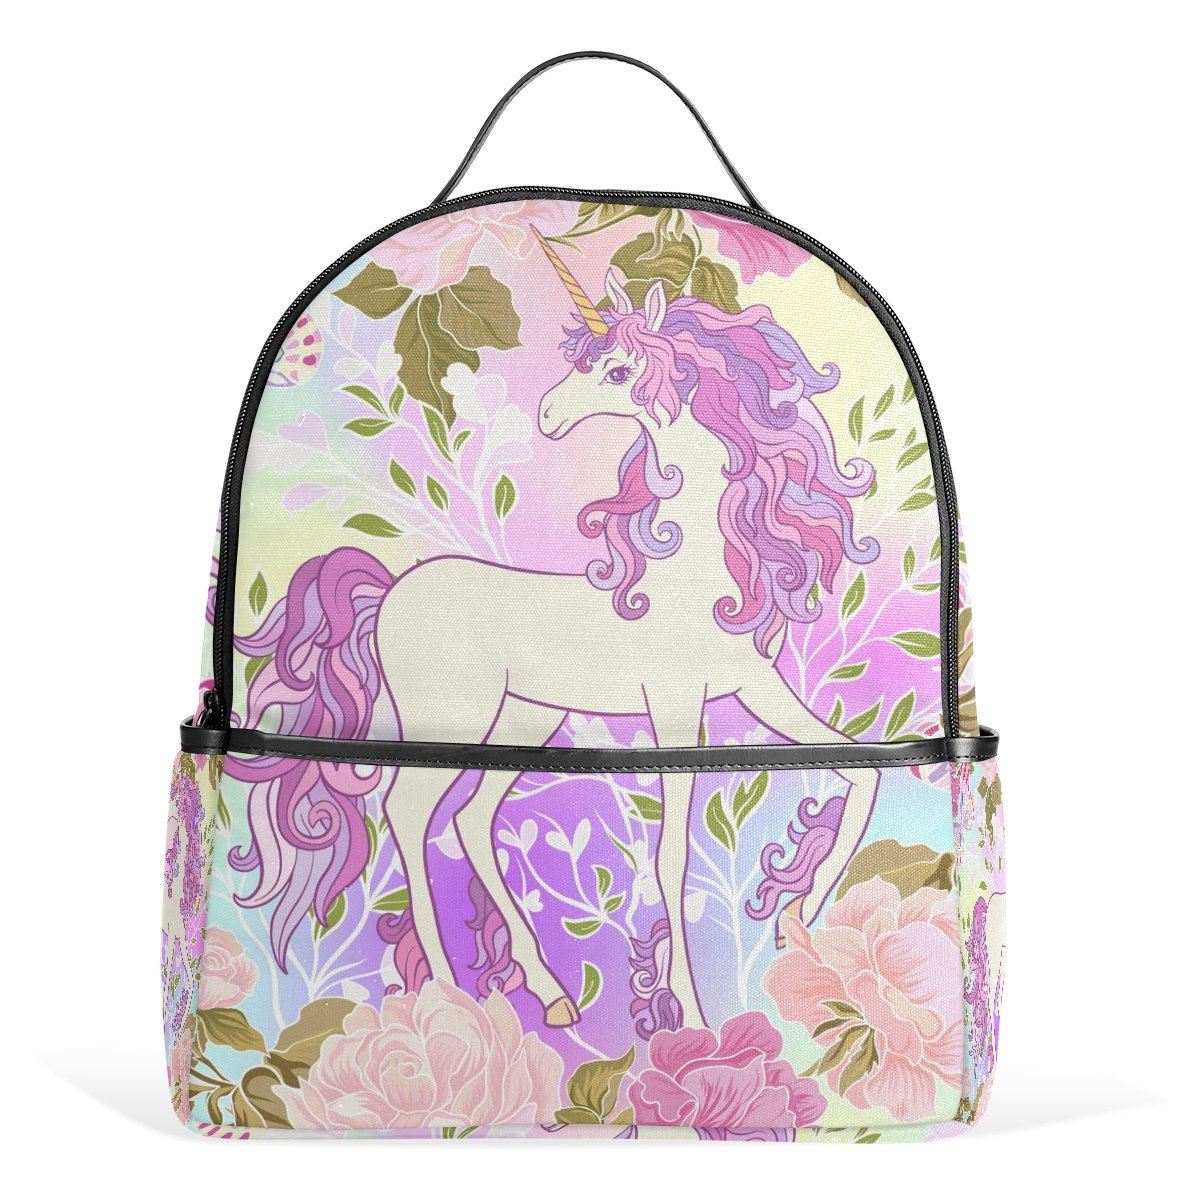 JSTEL Unicorn Mane Butterfly Rainbow Heart School Backpack 4th 5th 6th Grade  for Boys Teen Girls Kids  Amazon.co.uk  Clothing 7e20bcaafd17c